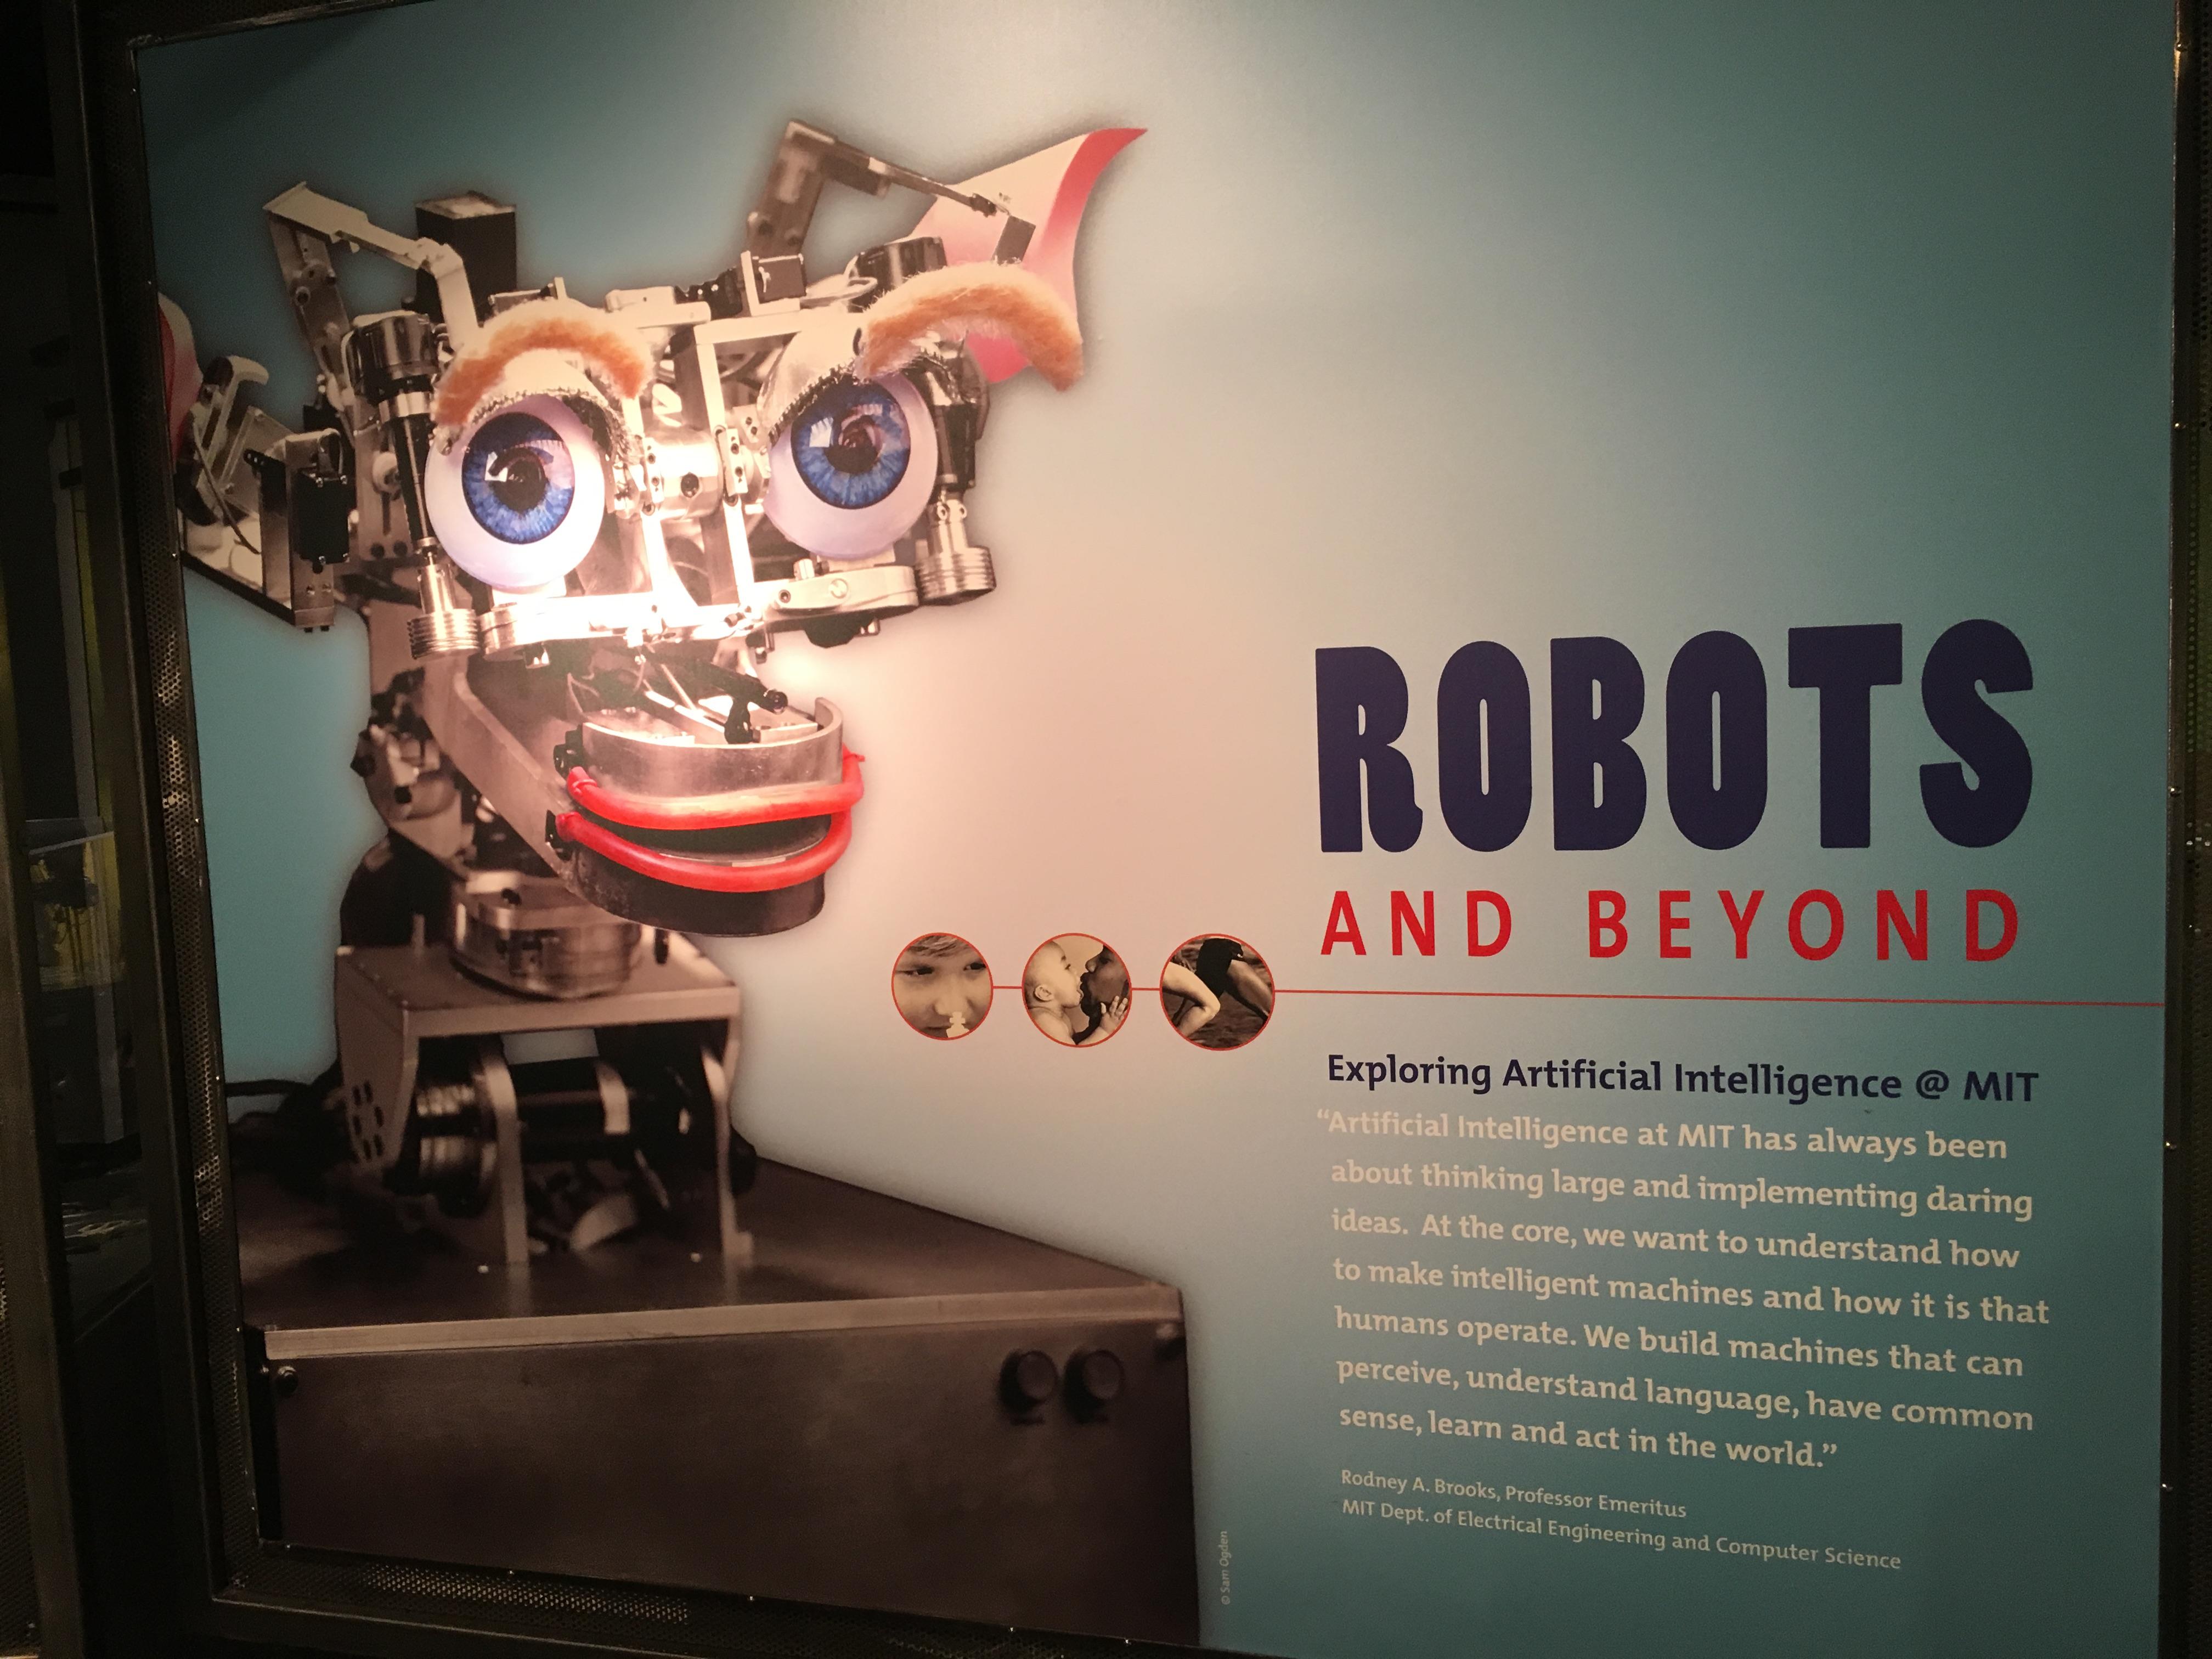 MIT Museum Robot Exhibit: Virtual Tour